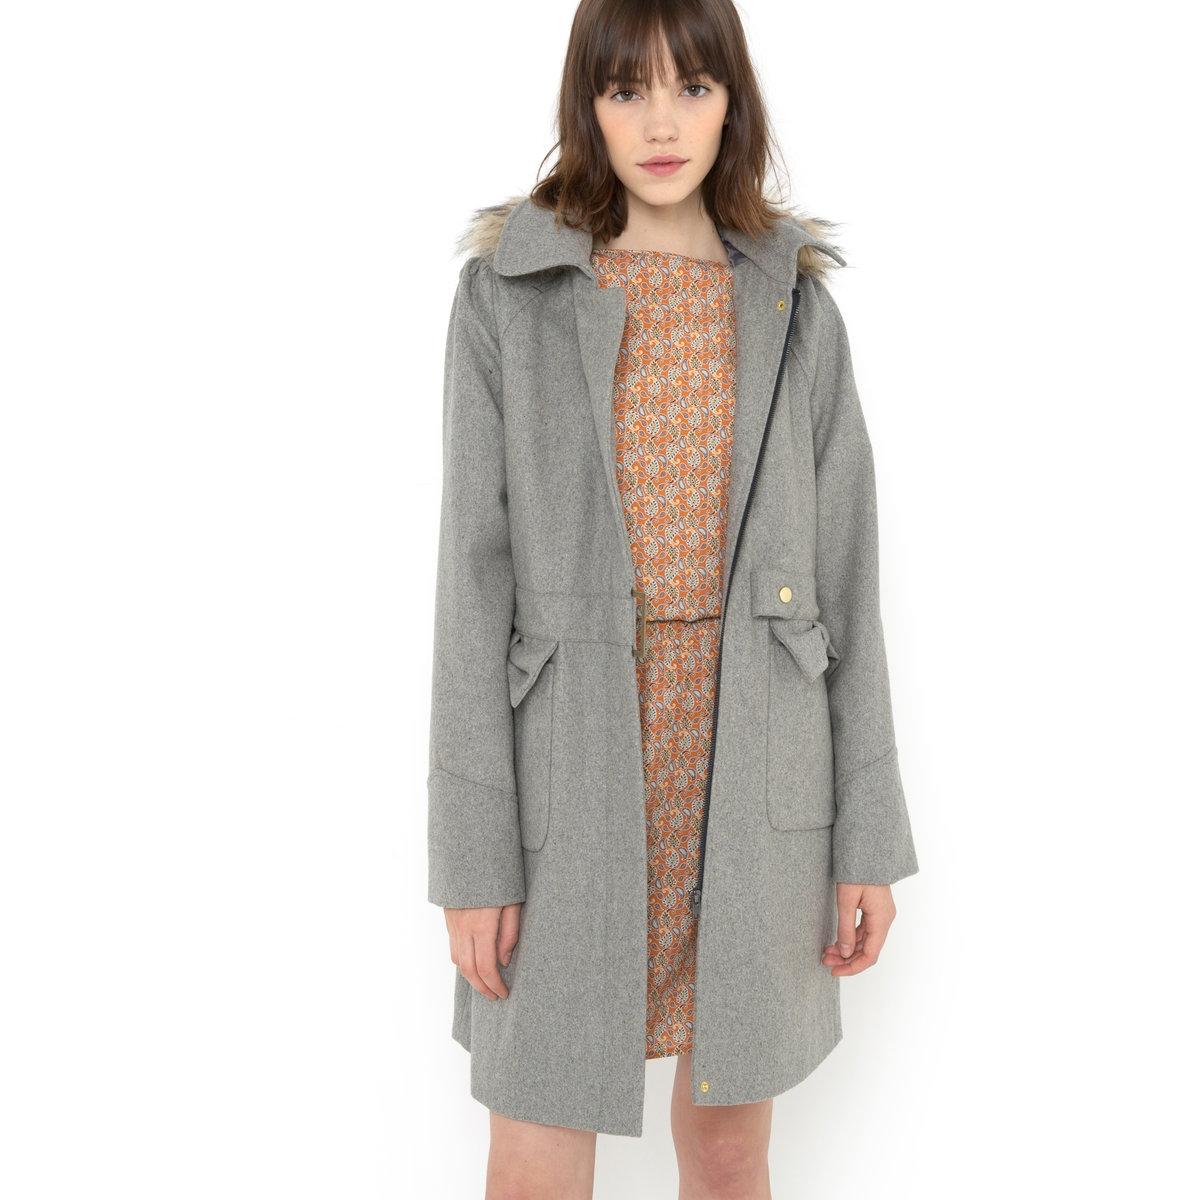 Пальто фасона трапеция, 60% шерсти